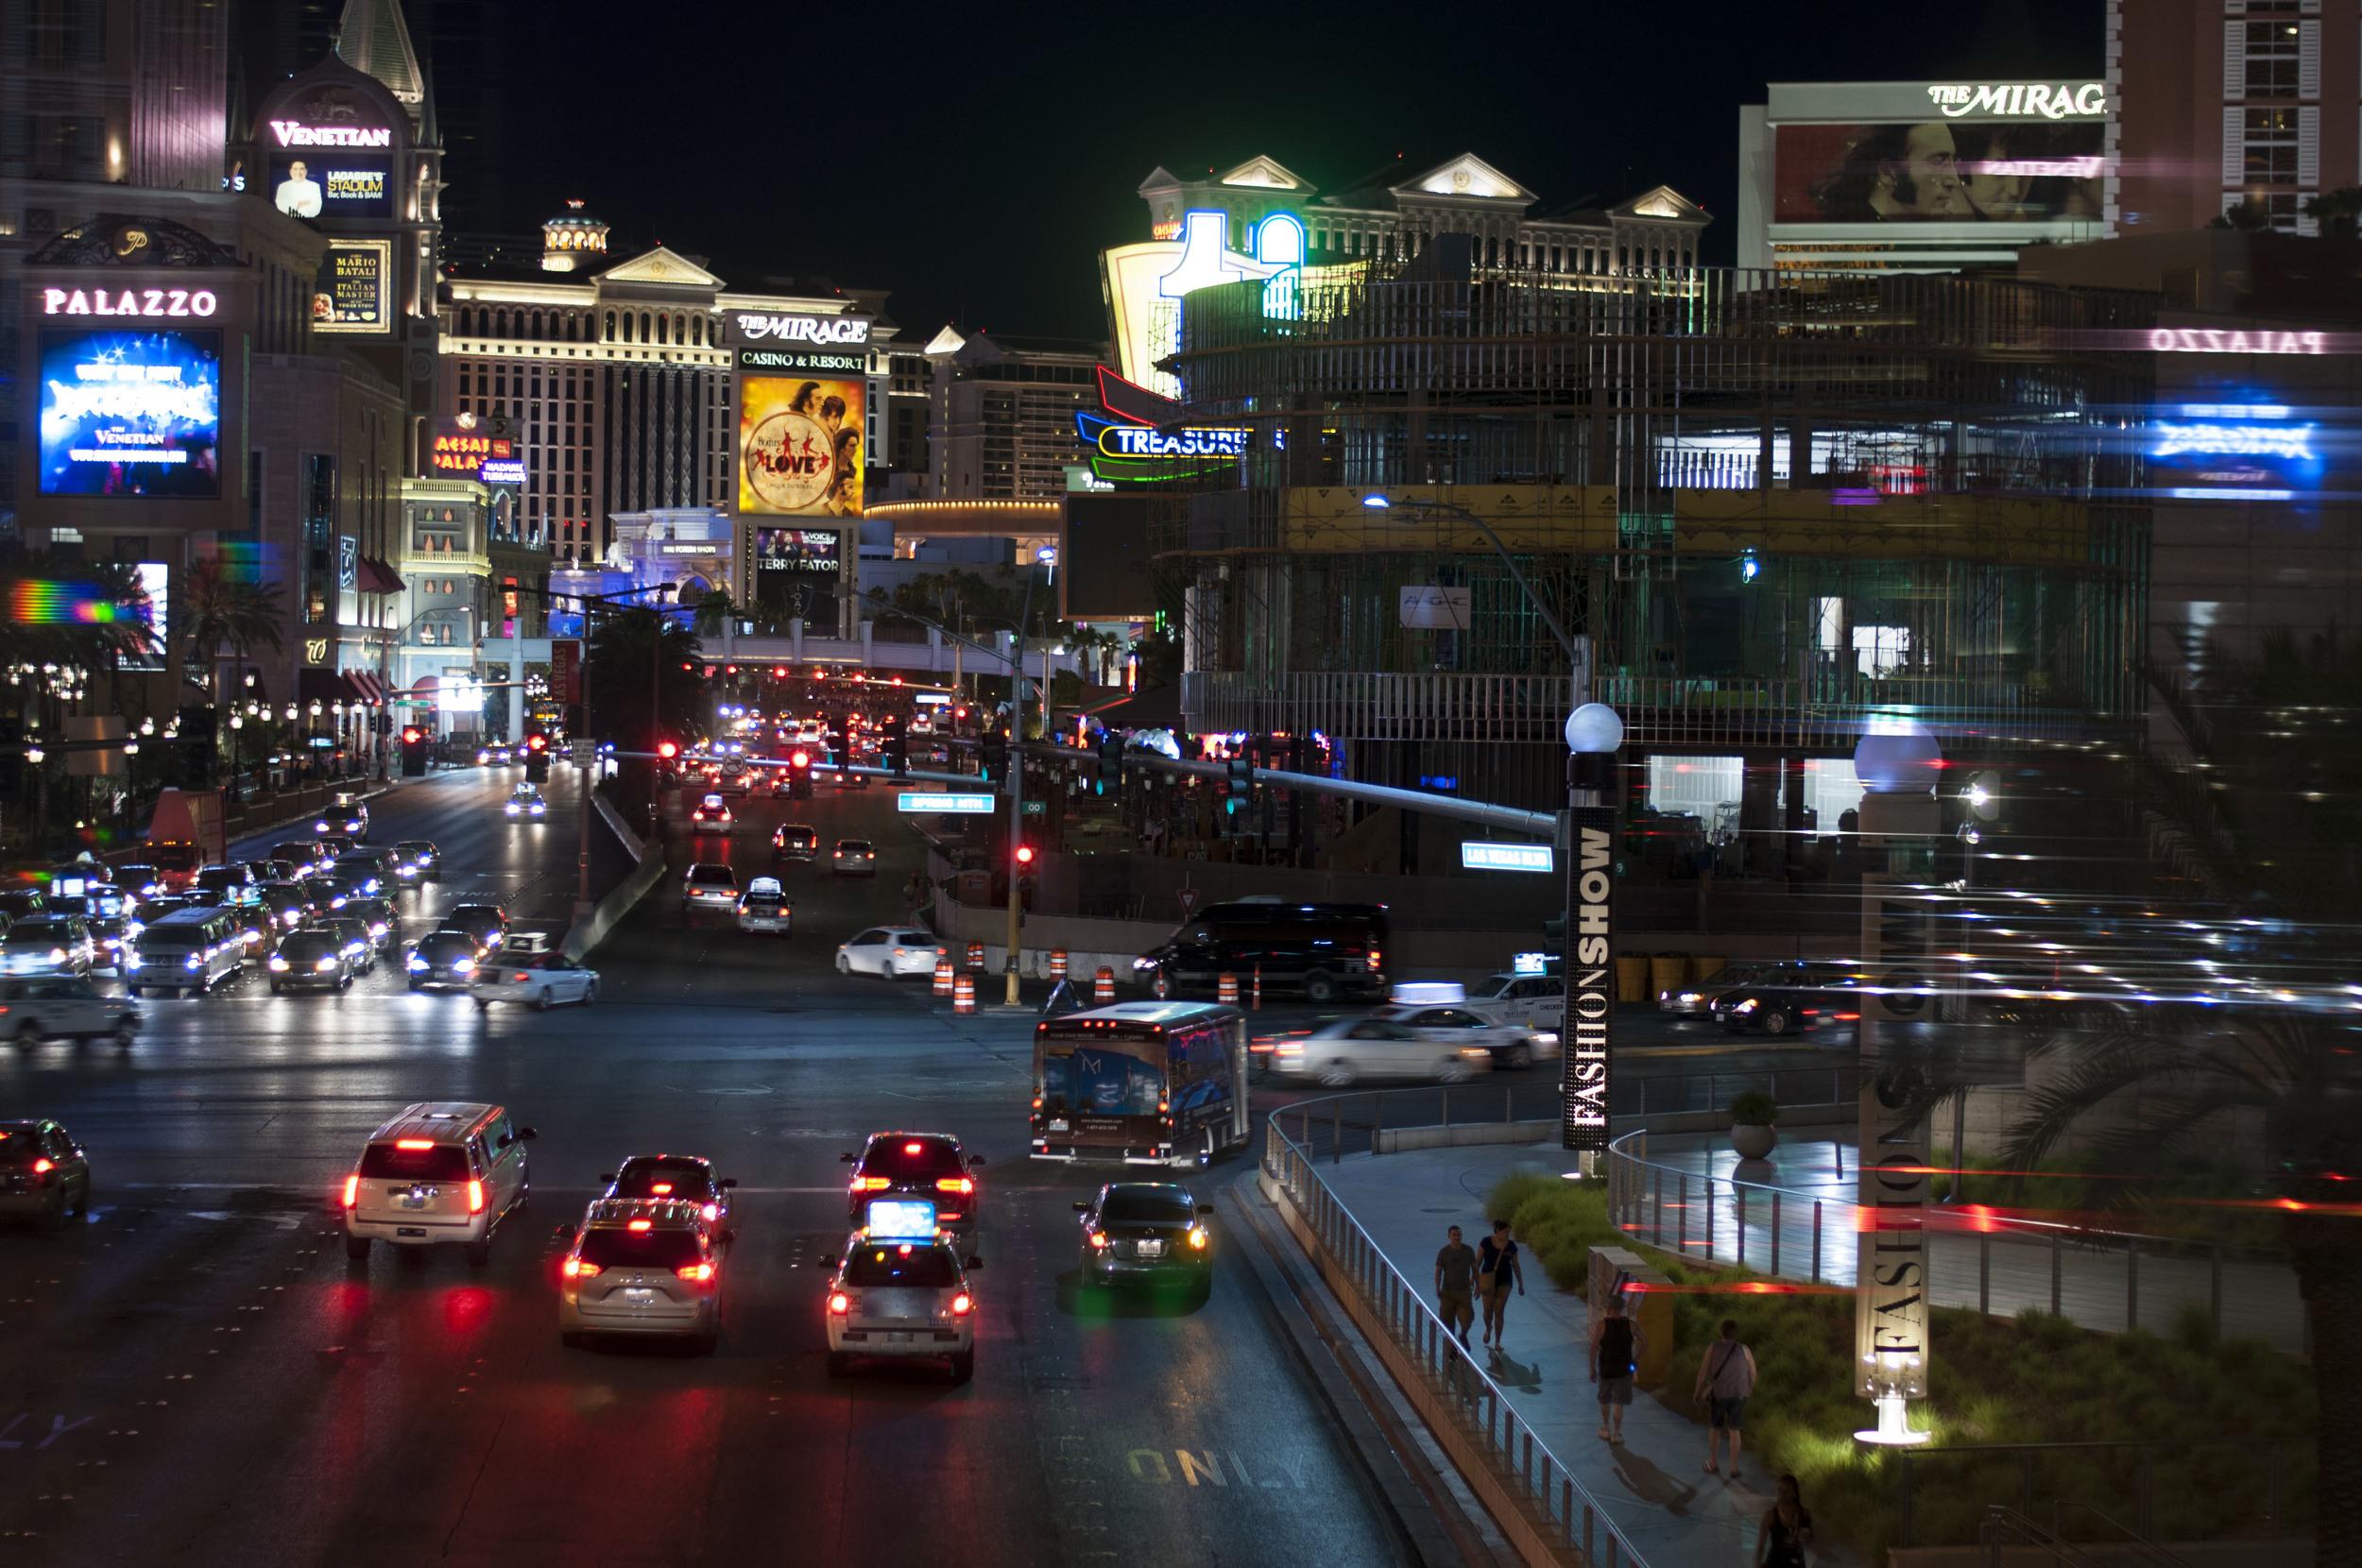 Las Vegas_76.jpg